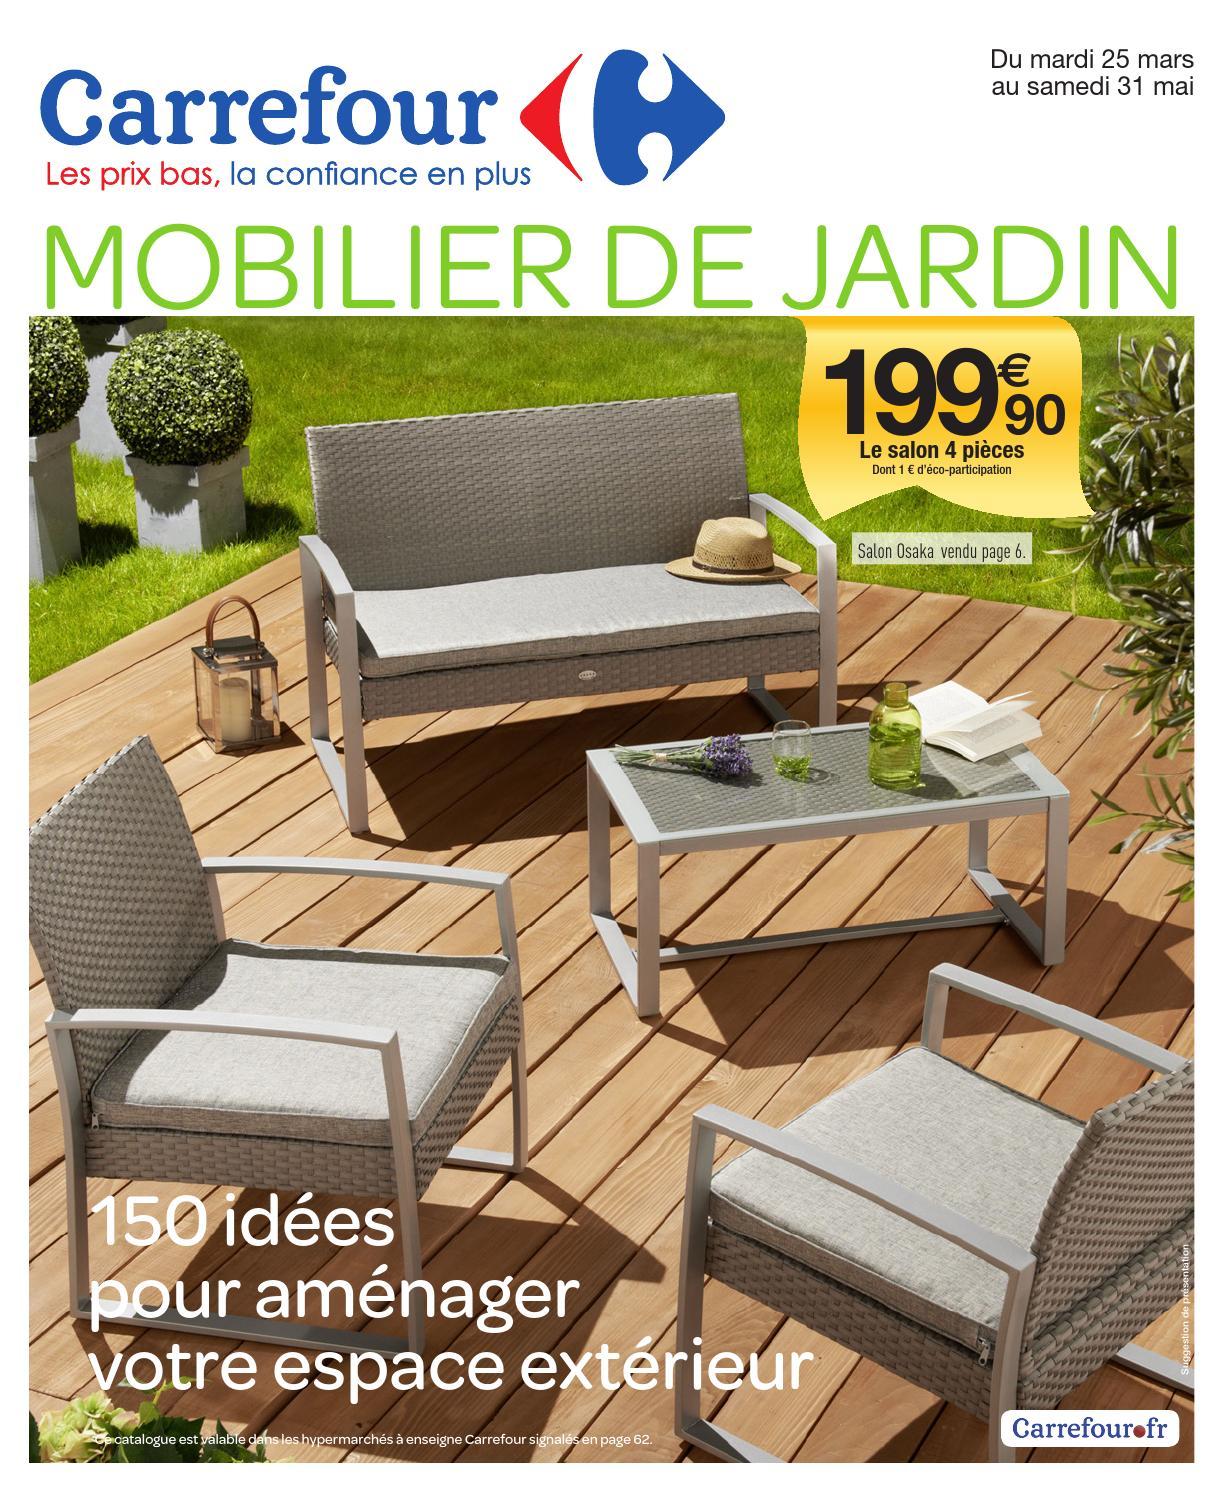 Fauteuil De Jardin Carrefour Market Table De Lit A Roulettes # Table De Jardin A Roulettes